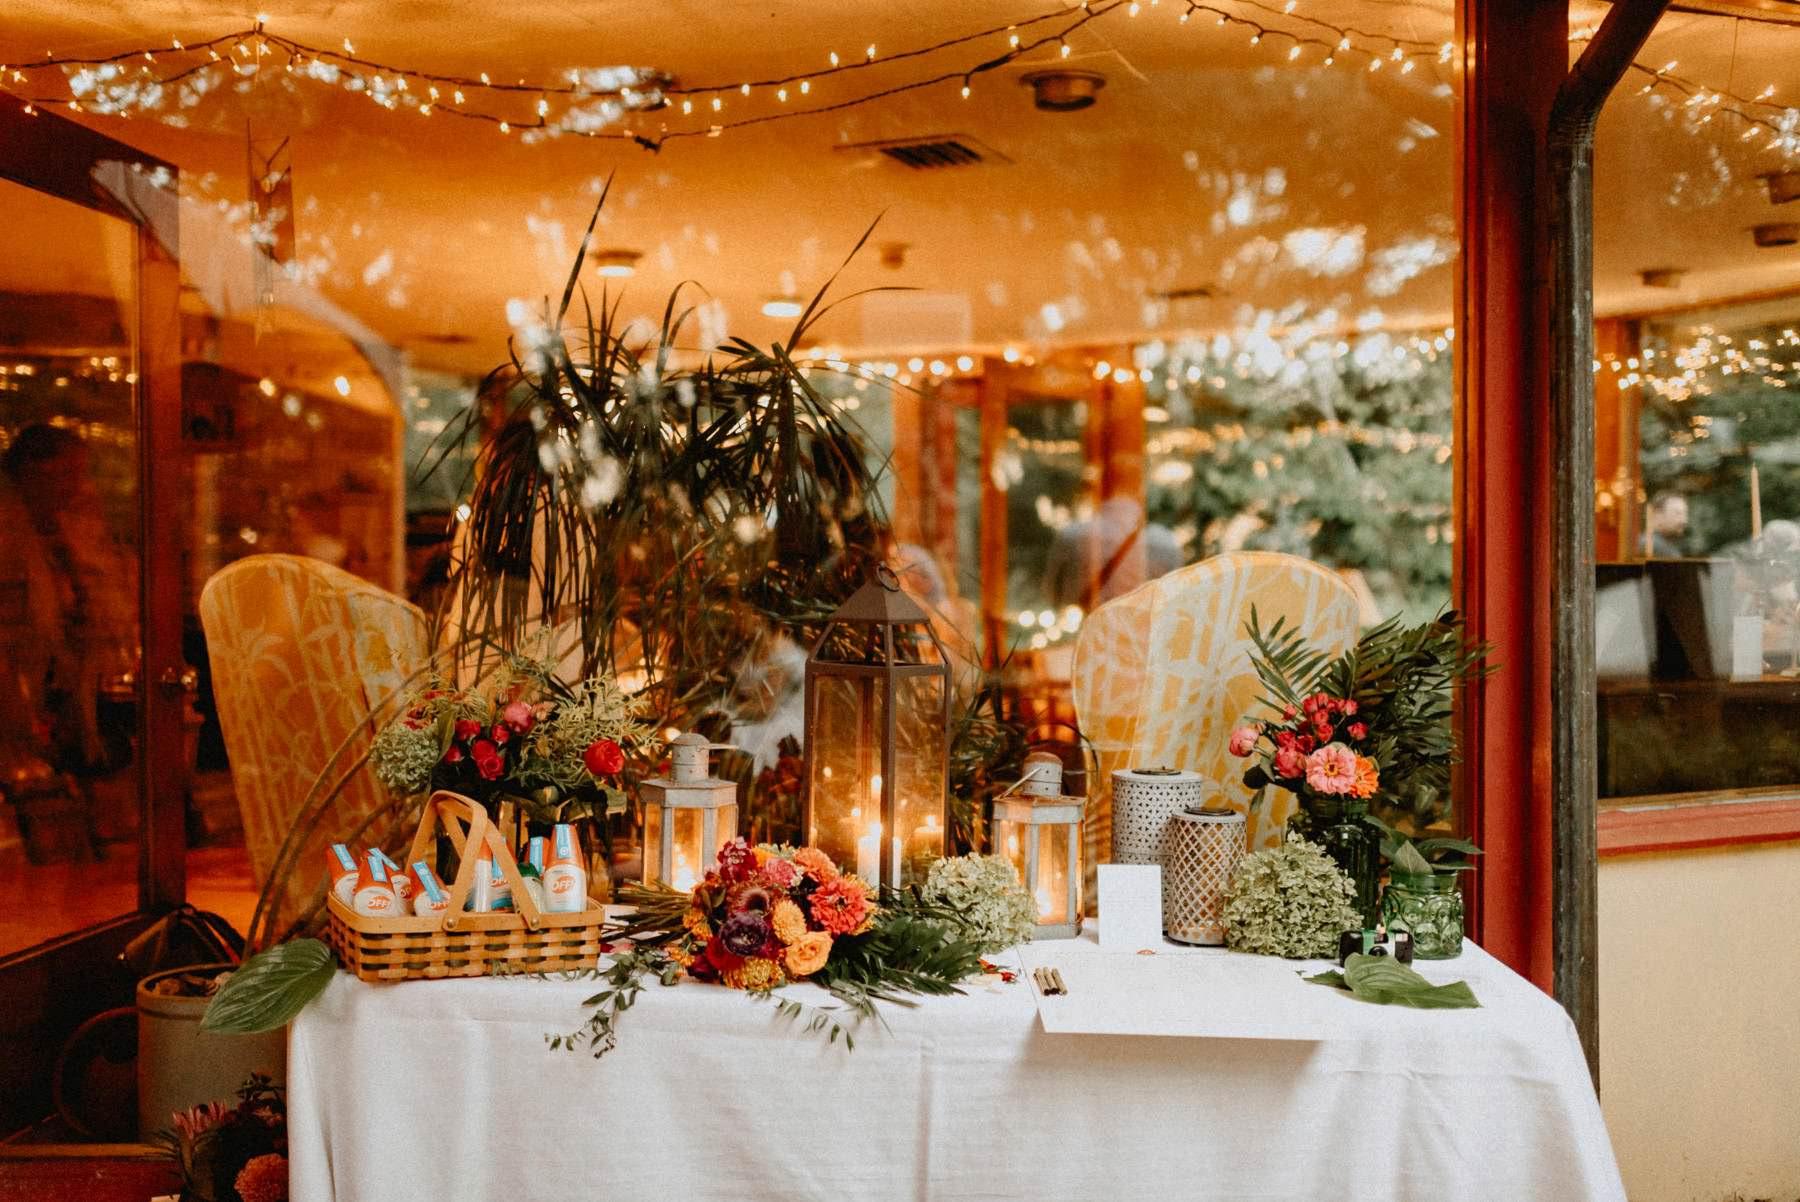 pennsylvania-private-estate-wedding-118.jpg